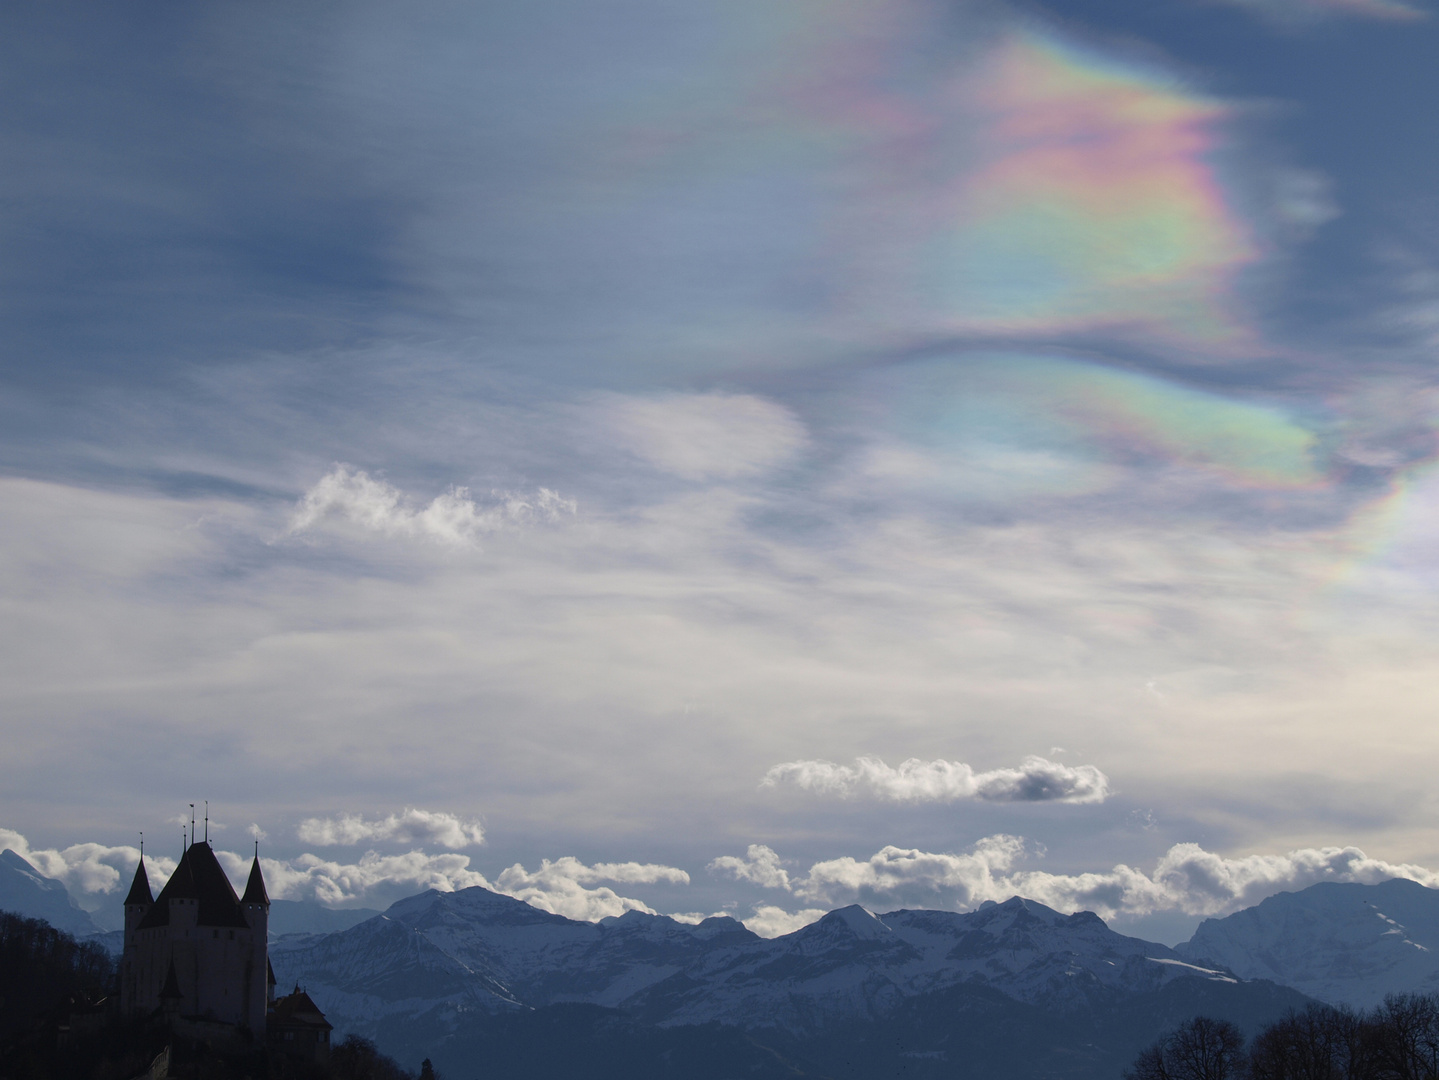 crasy Sky crasy Day - Irisirende Wolken